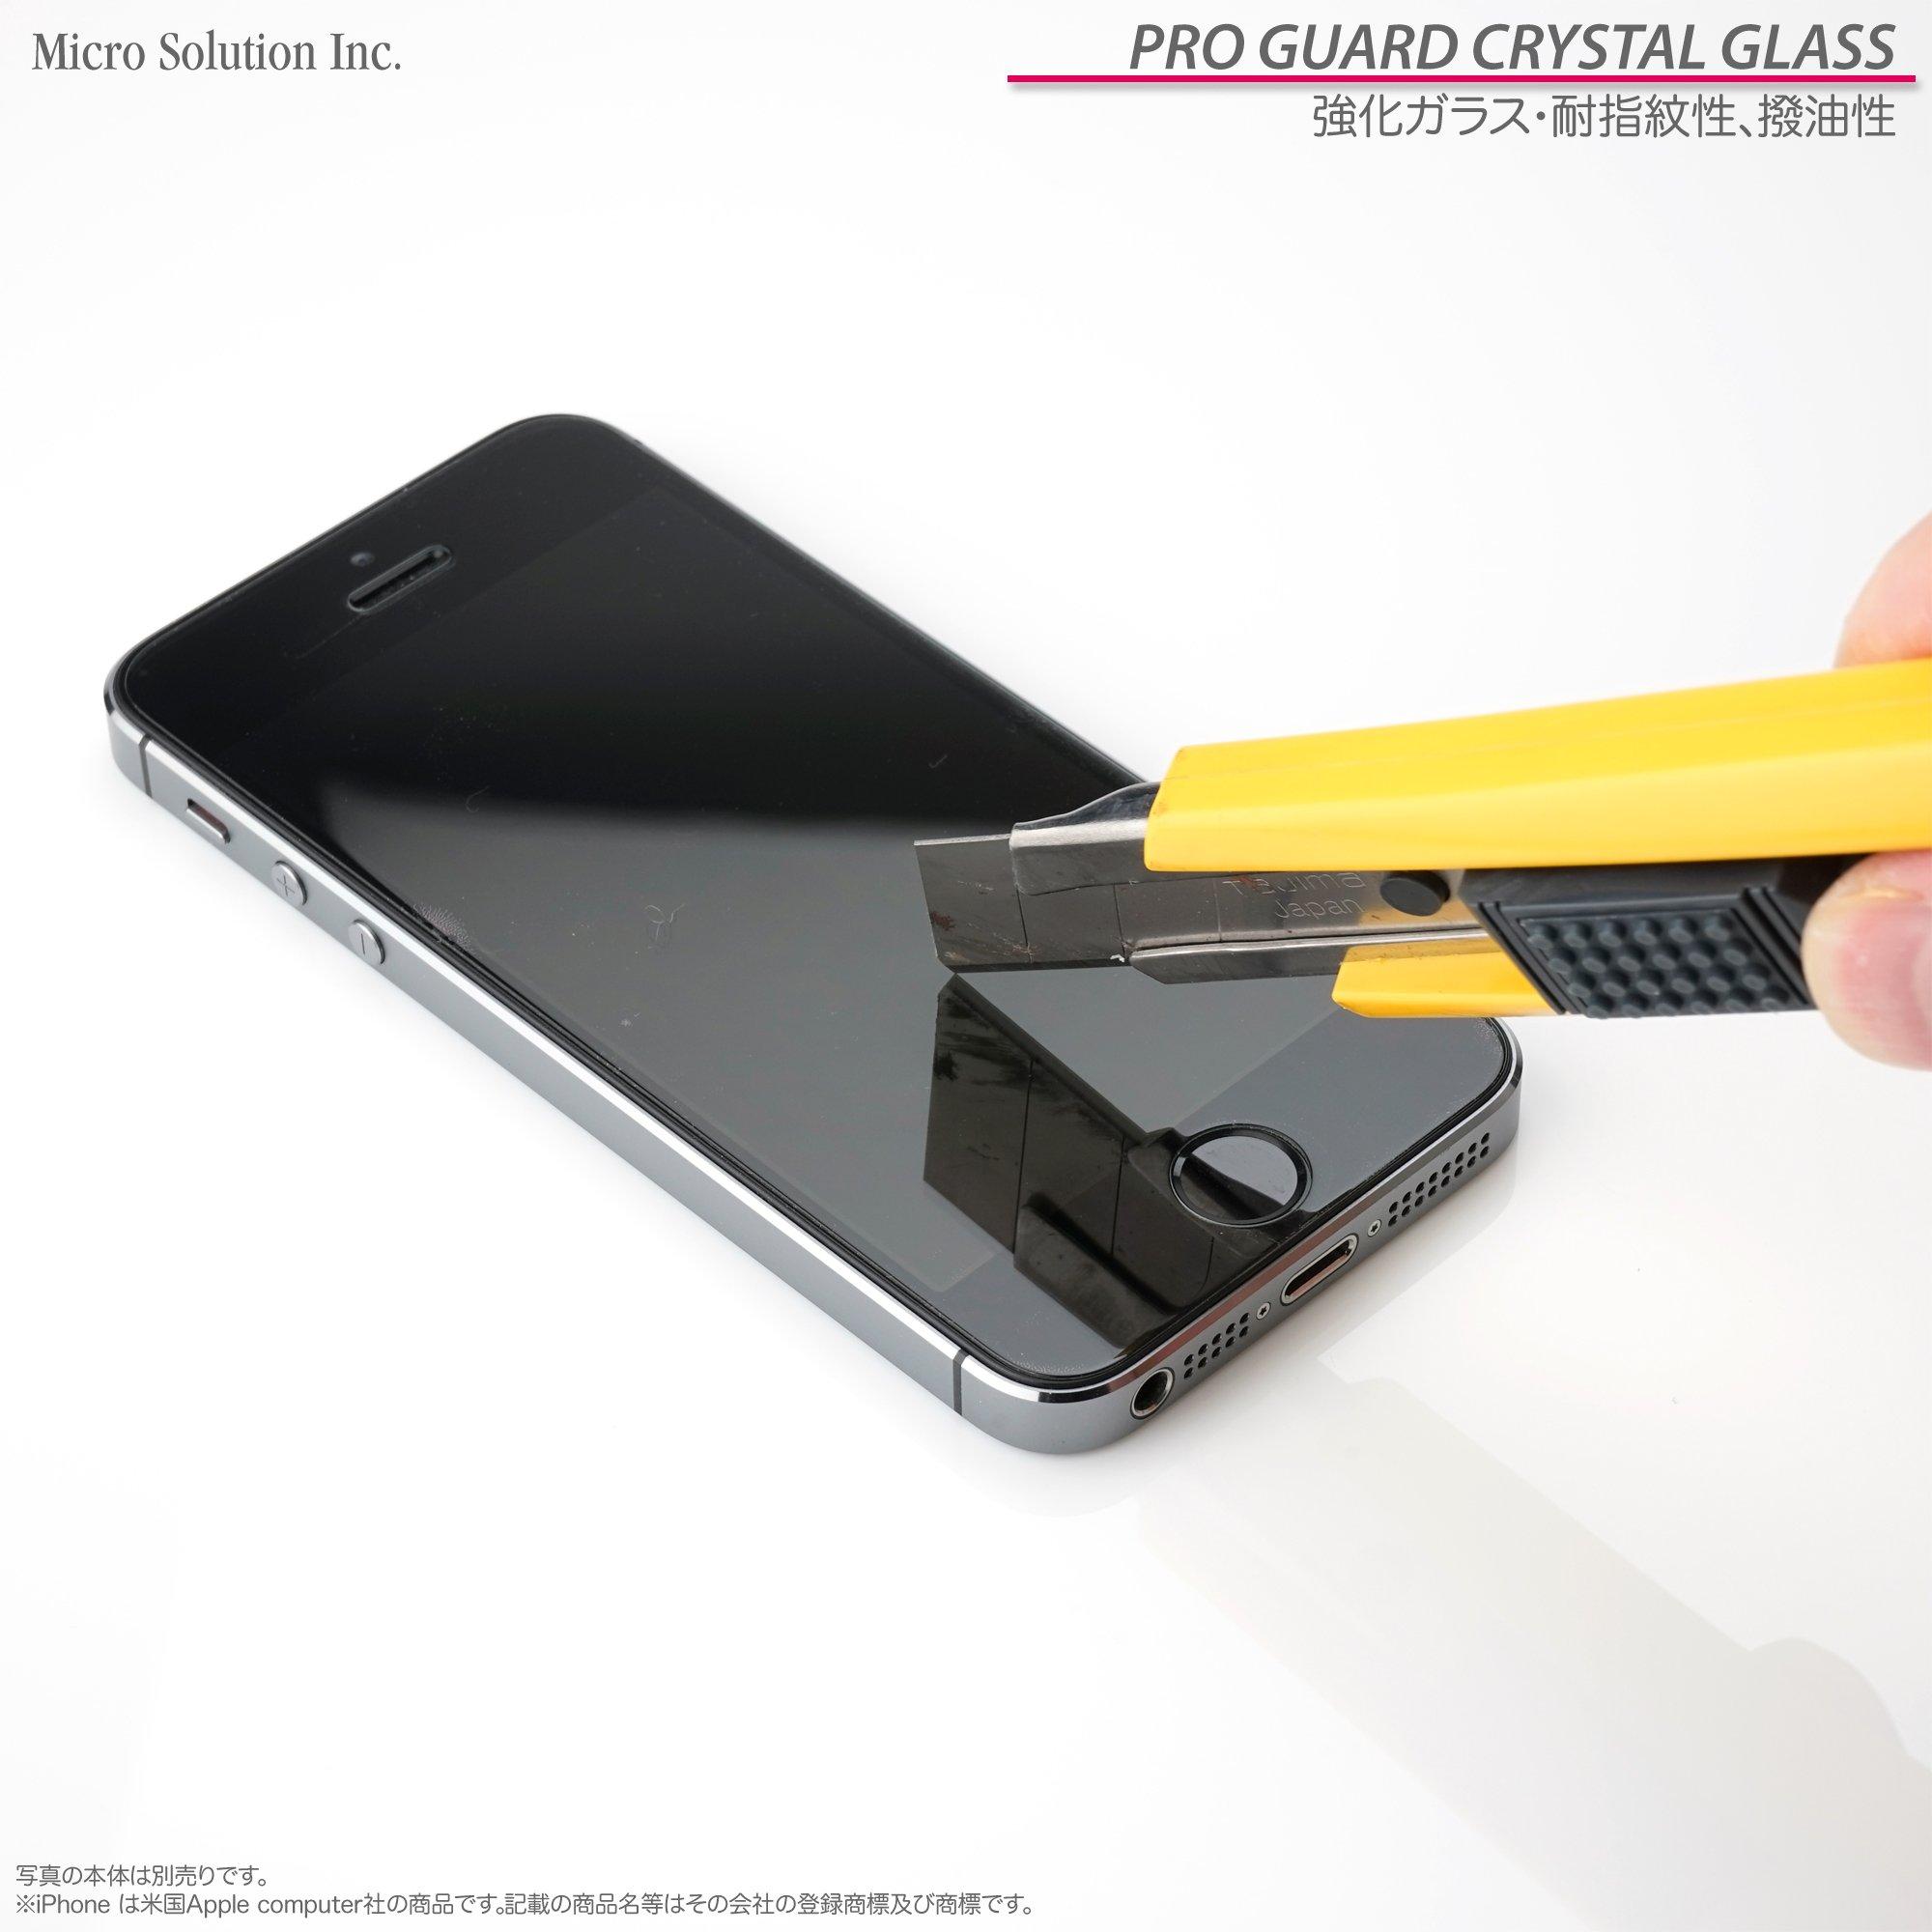 PRO GUARD CRYSTAL GLASS ラウンドエッジ 0.3mm 透明強化ガラス・耐指紋、撥油性 (iPhone 5S,5,5C, 強化ガラス) PGCG-RGRE-NH-IPH5